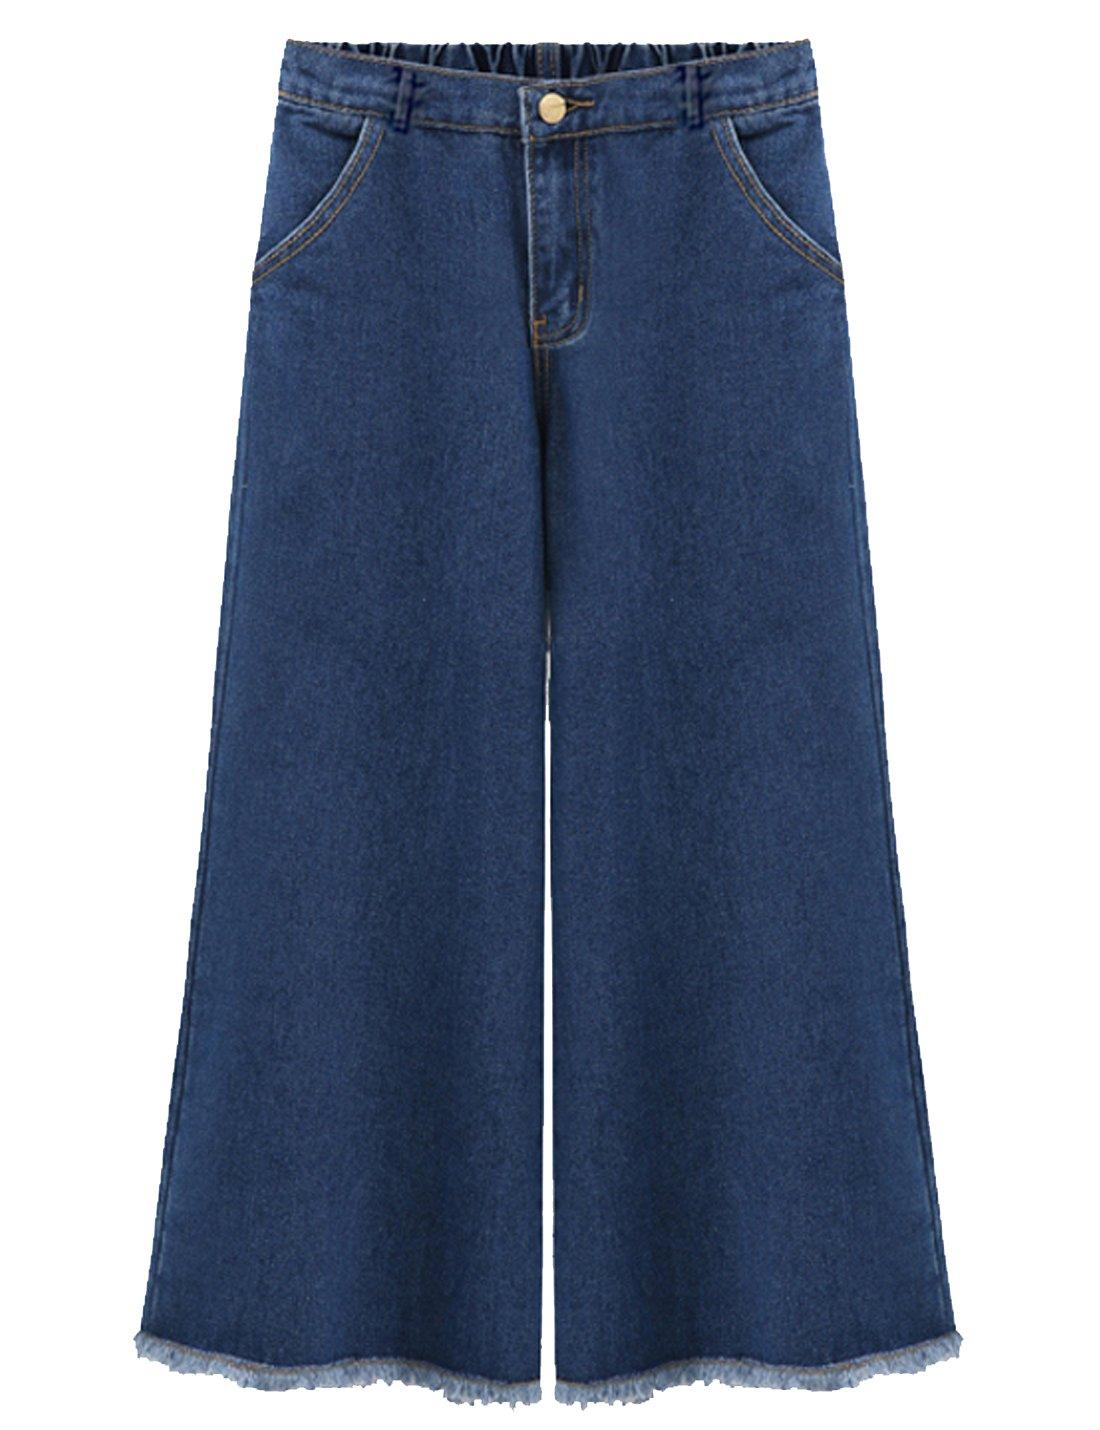 Flygo Women's Elastic Waist Wide Leg Frayed Hem Denim Cropped Jeans Pants (18W-20W, Dark Blue)